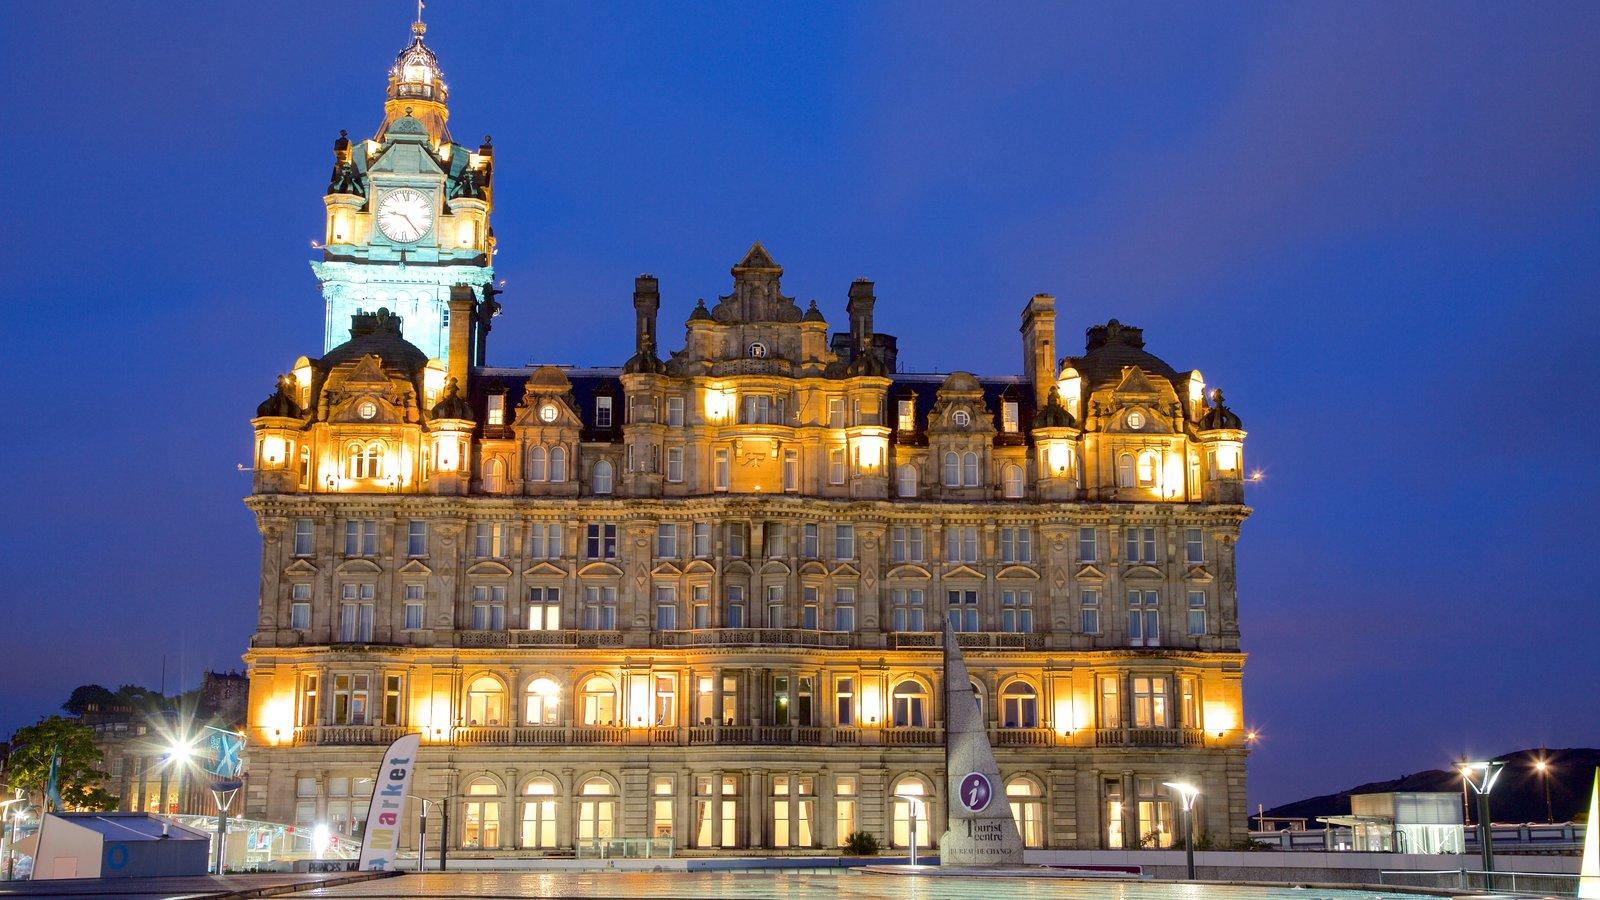 Edinburgh featuring heritage architecture and night scenes